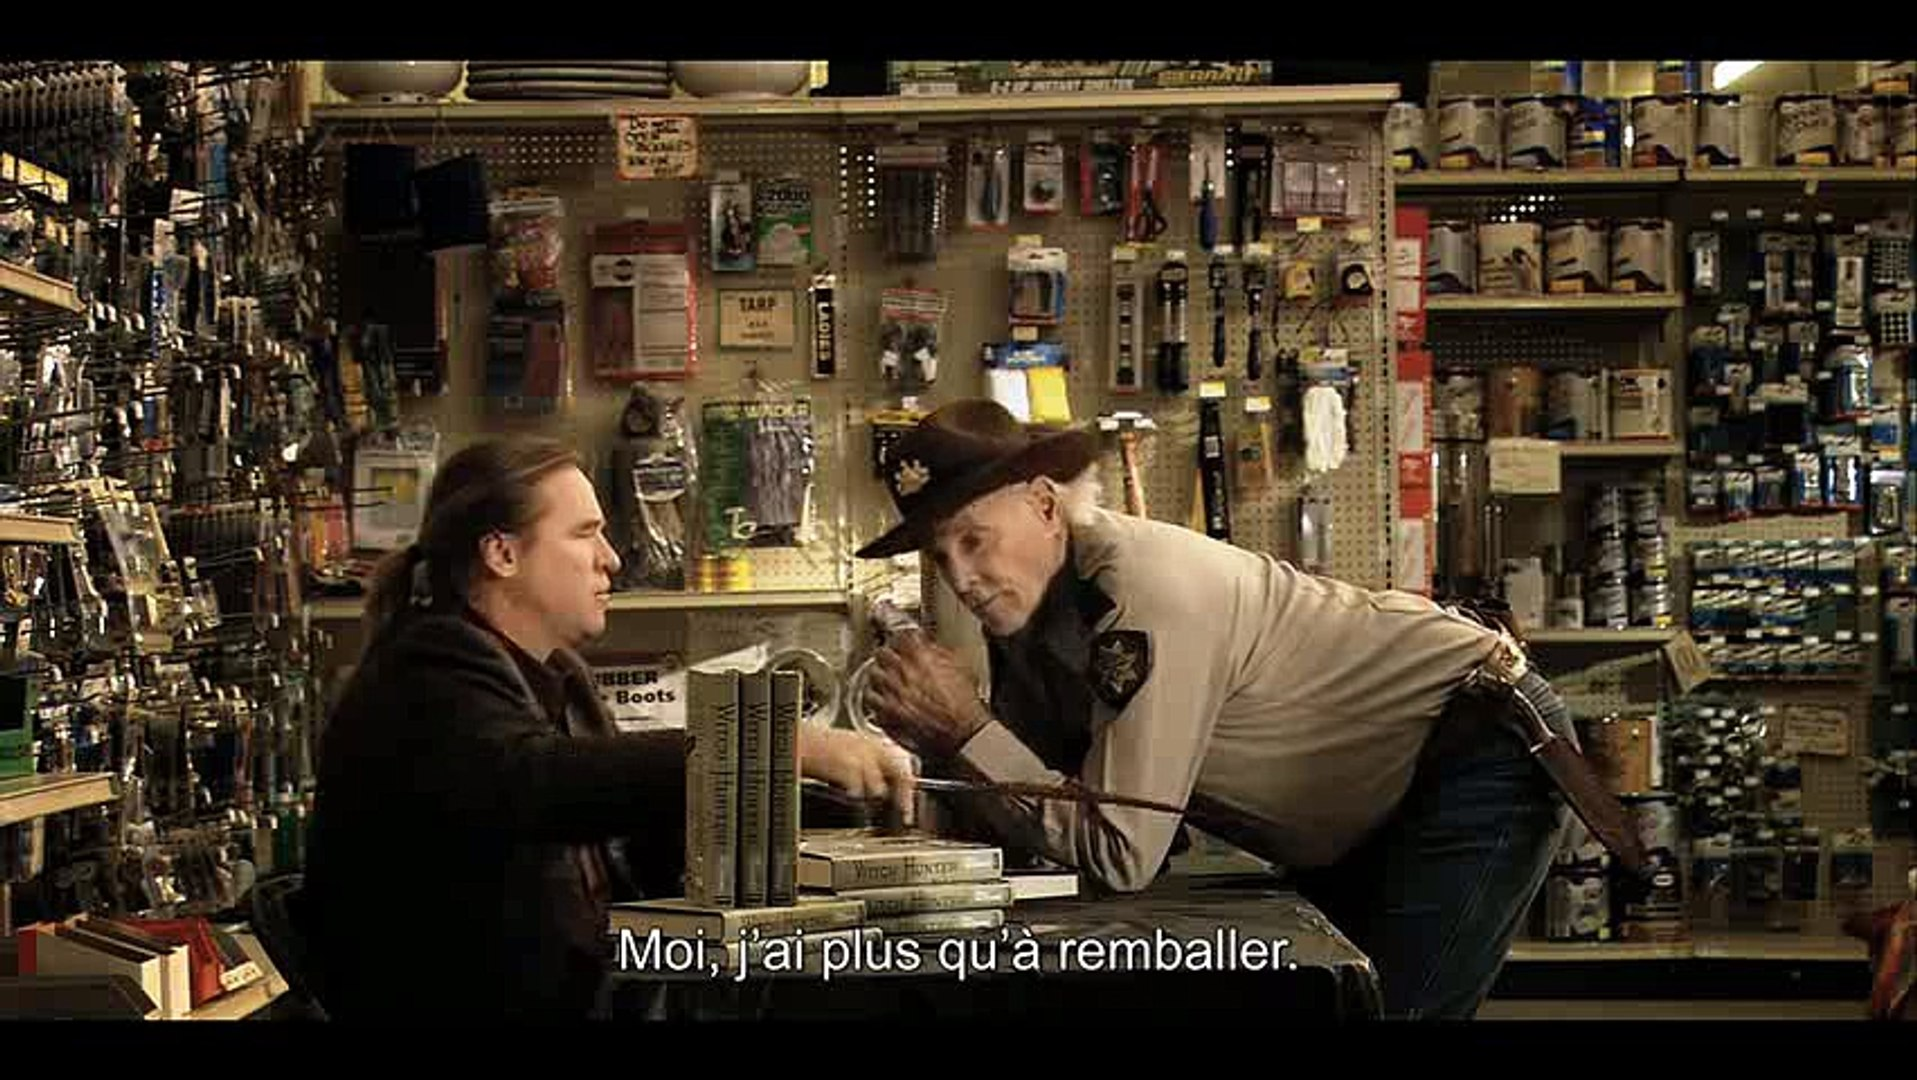 Bande-annonce Twixt de Francis Ford Coppola